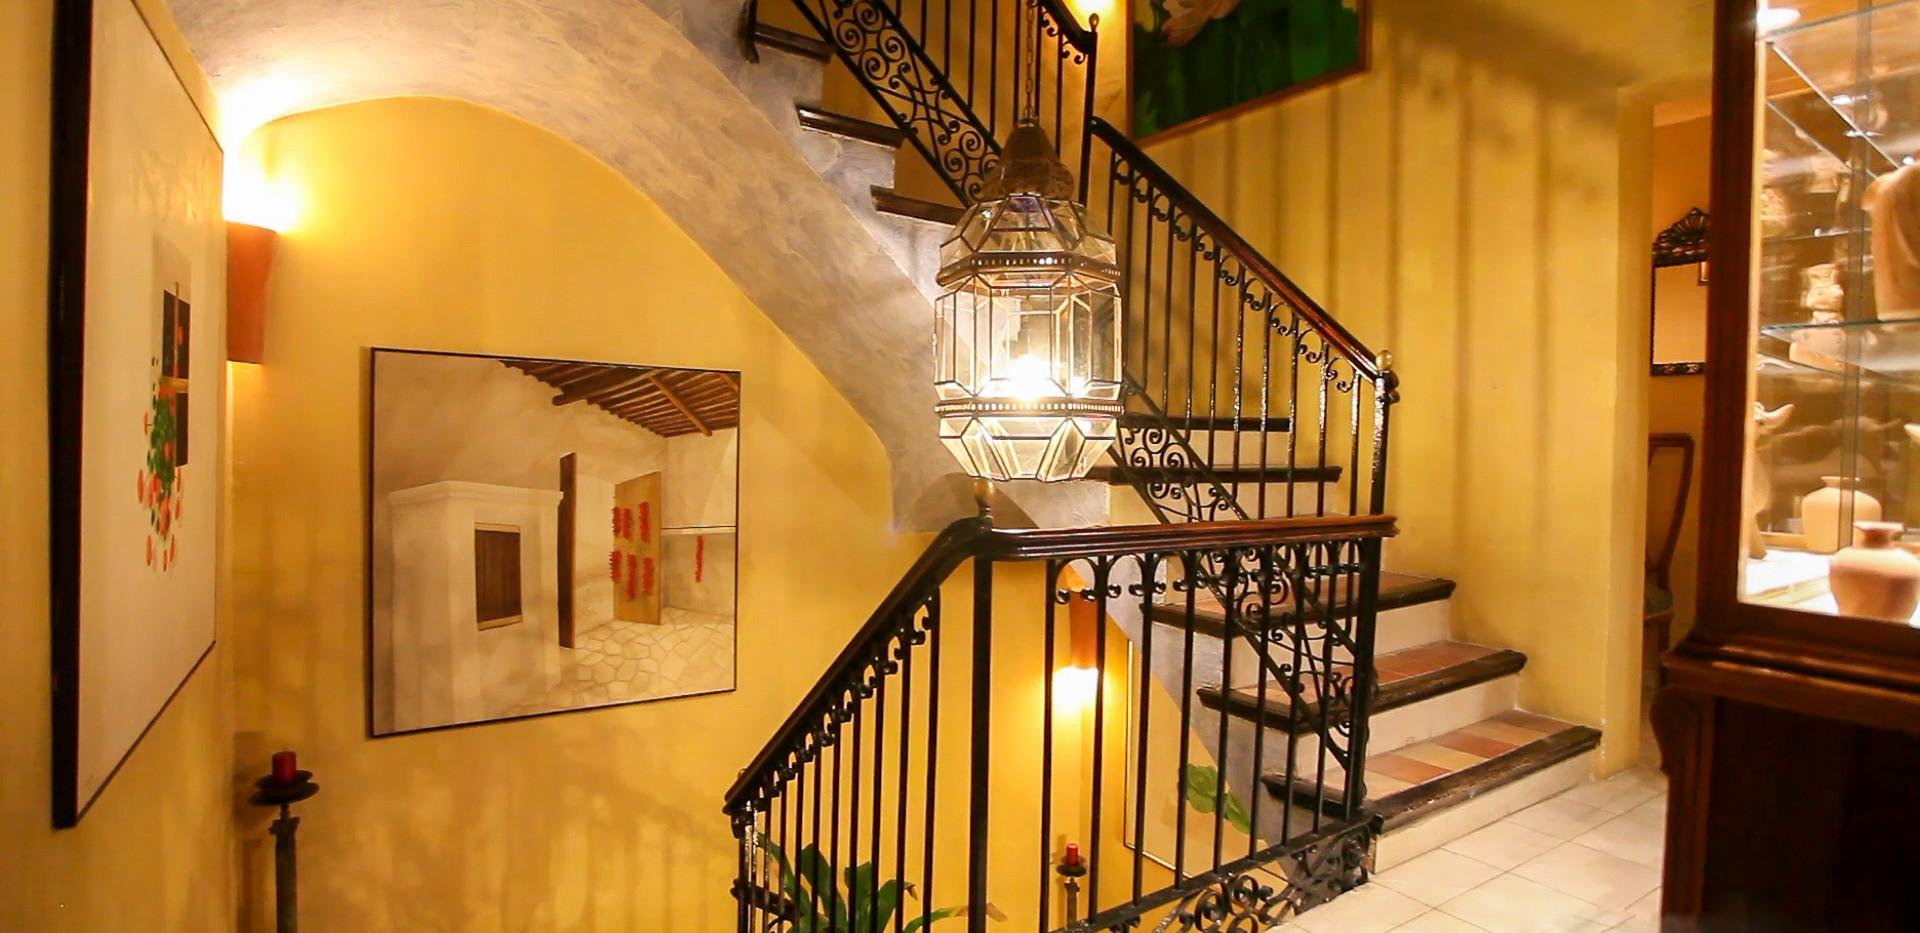 Hotel La Ventana - Segundo piso